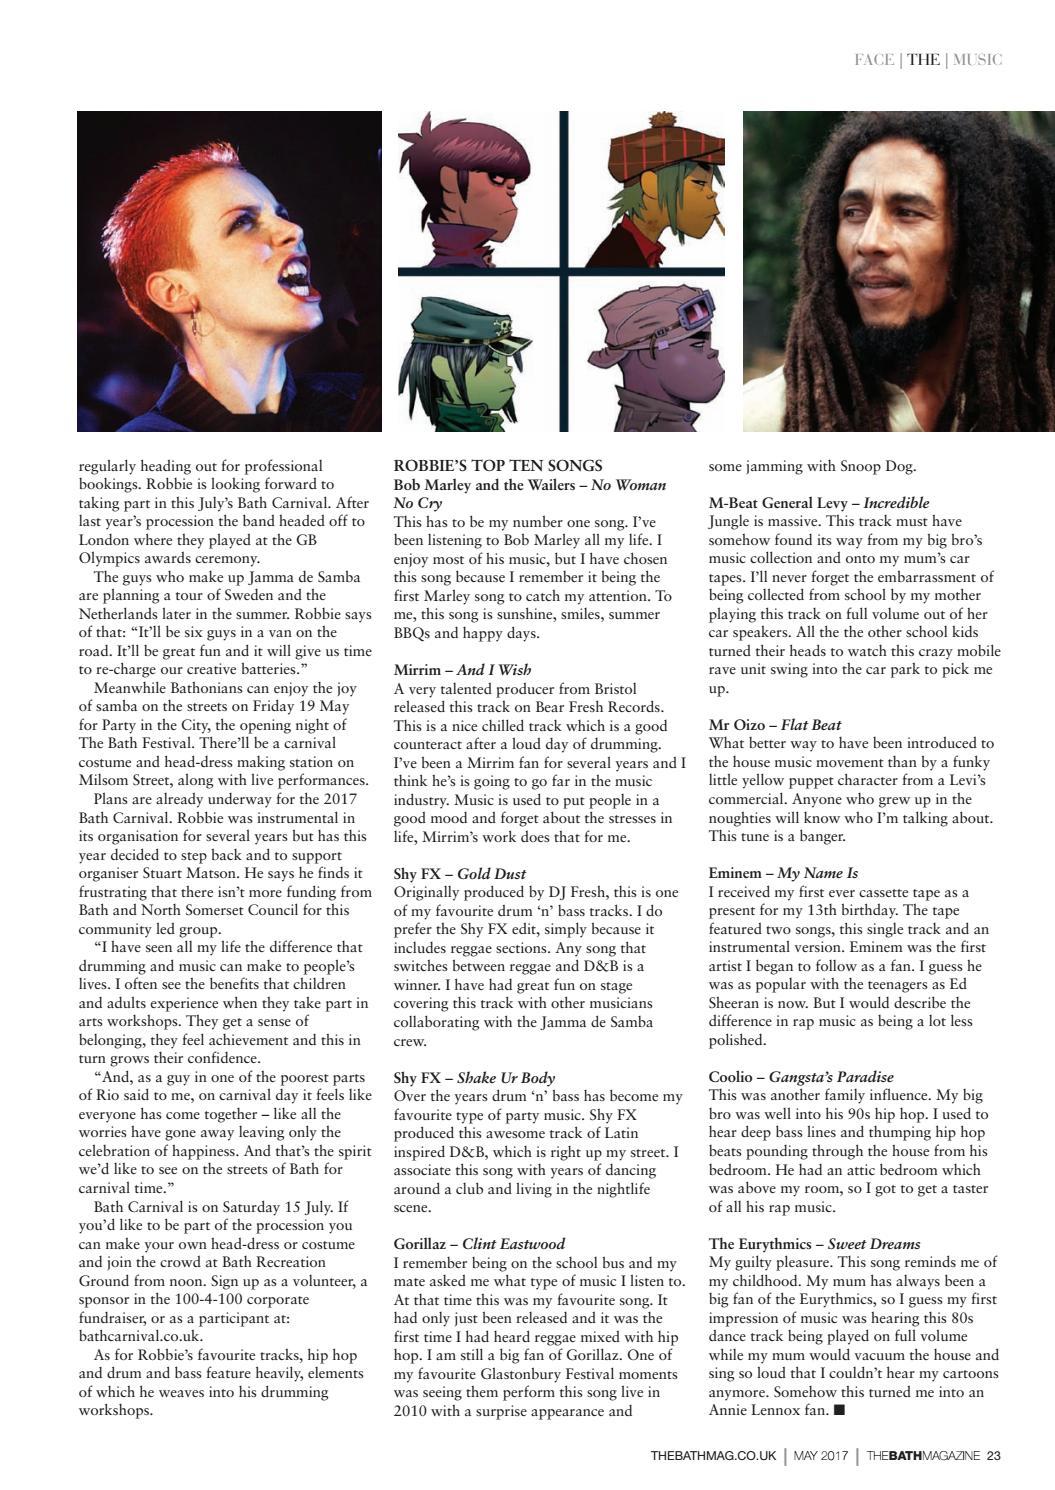 The Bath Magazine May 2017 by MC Publishing Limited - issuu